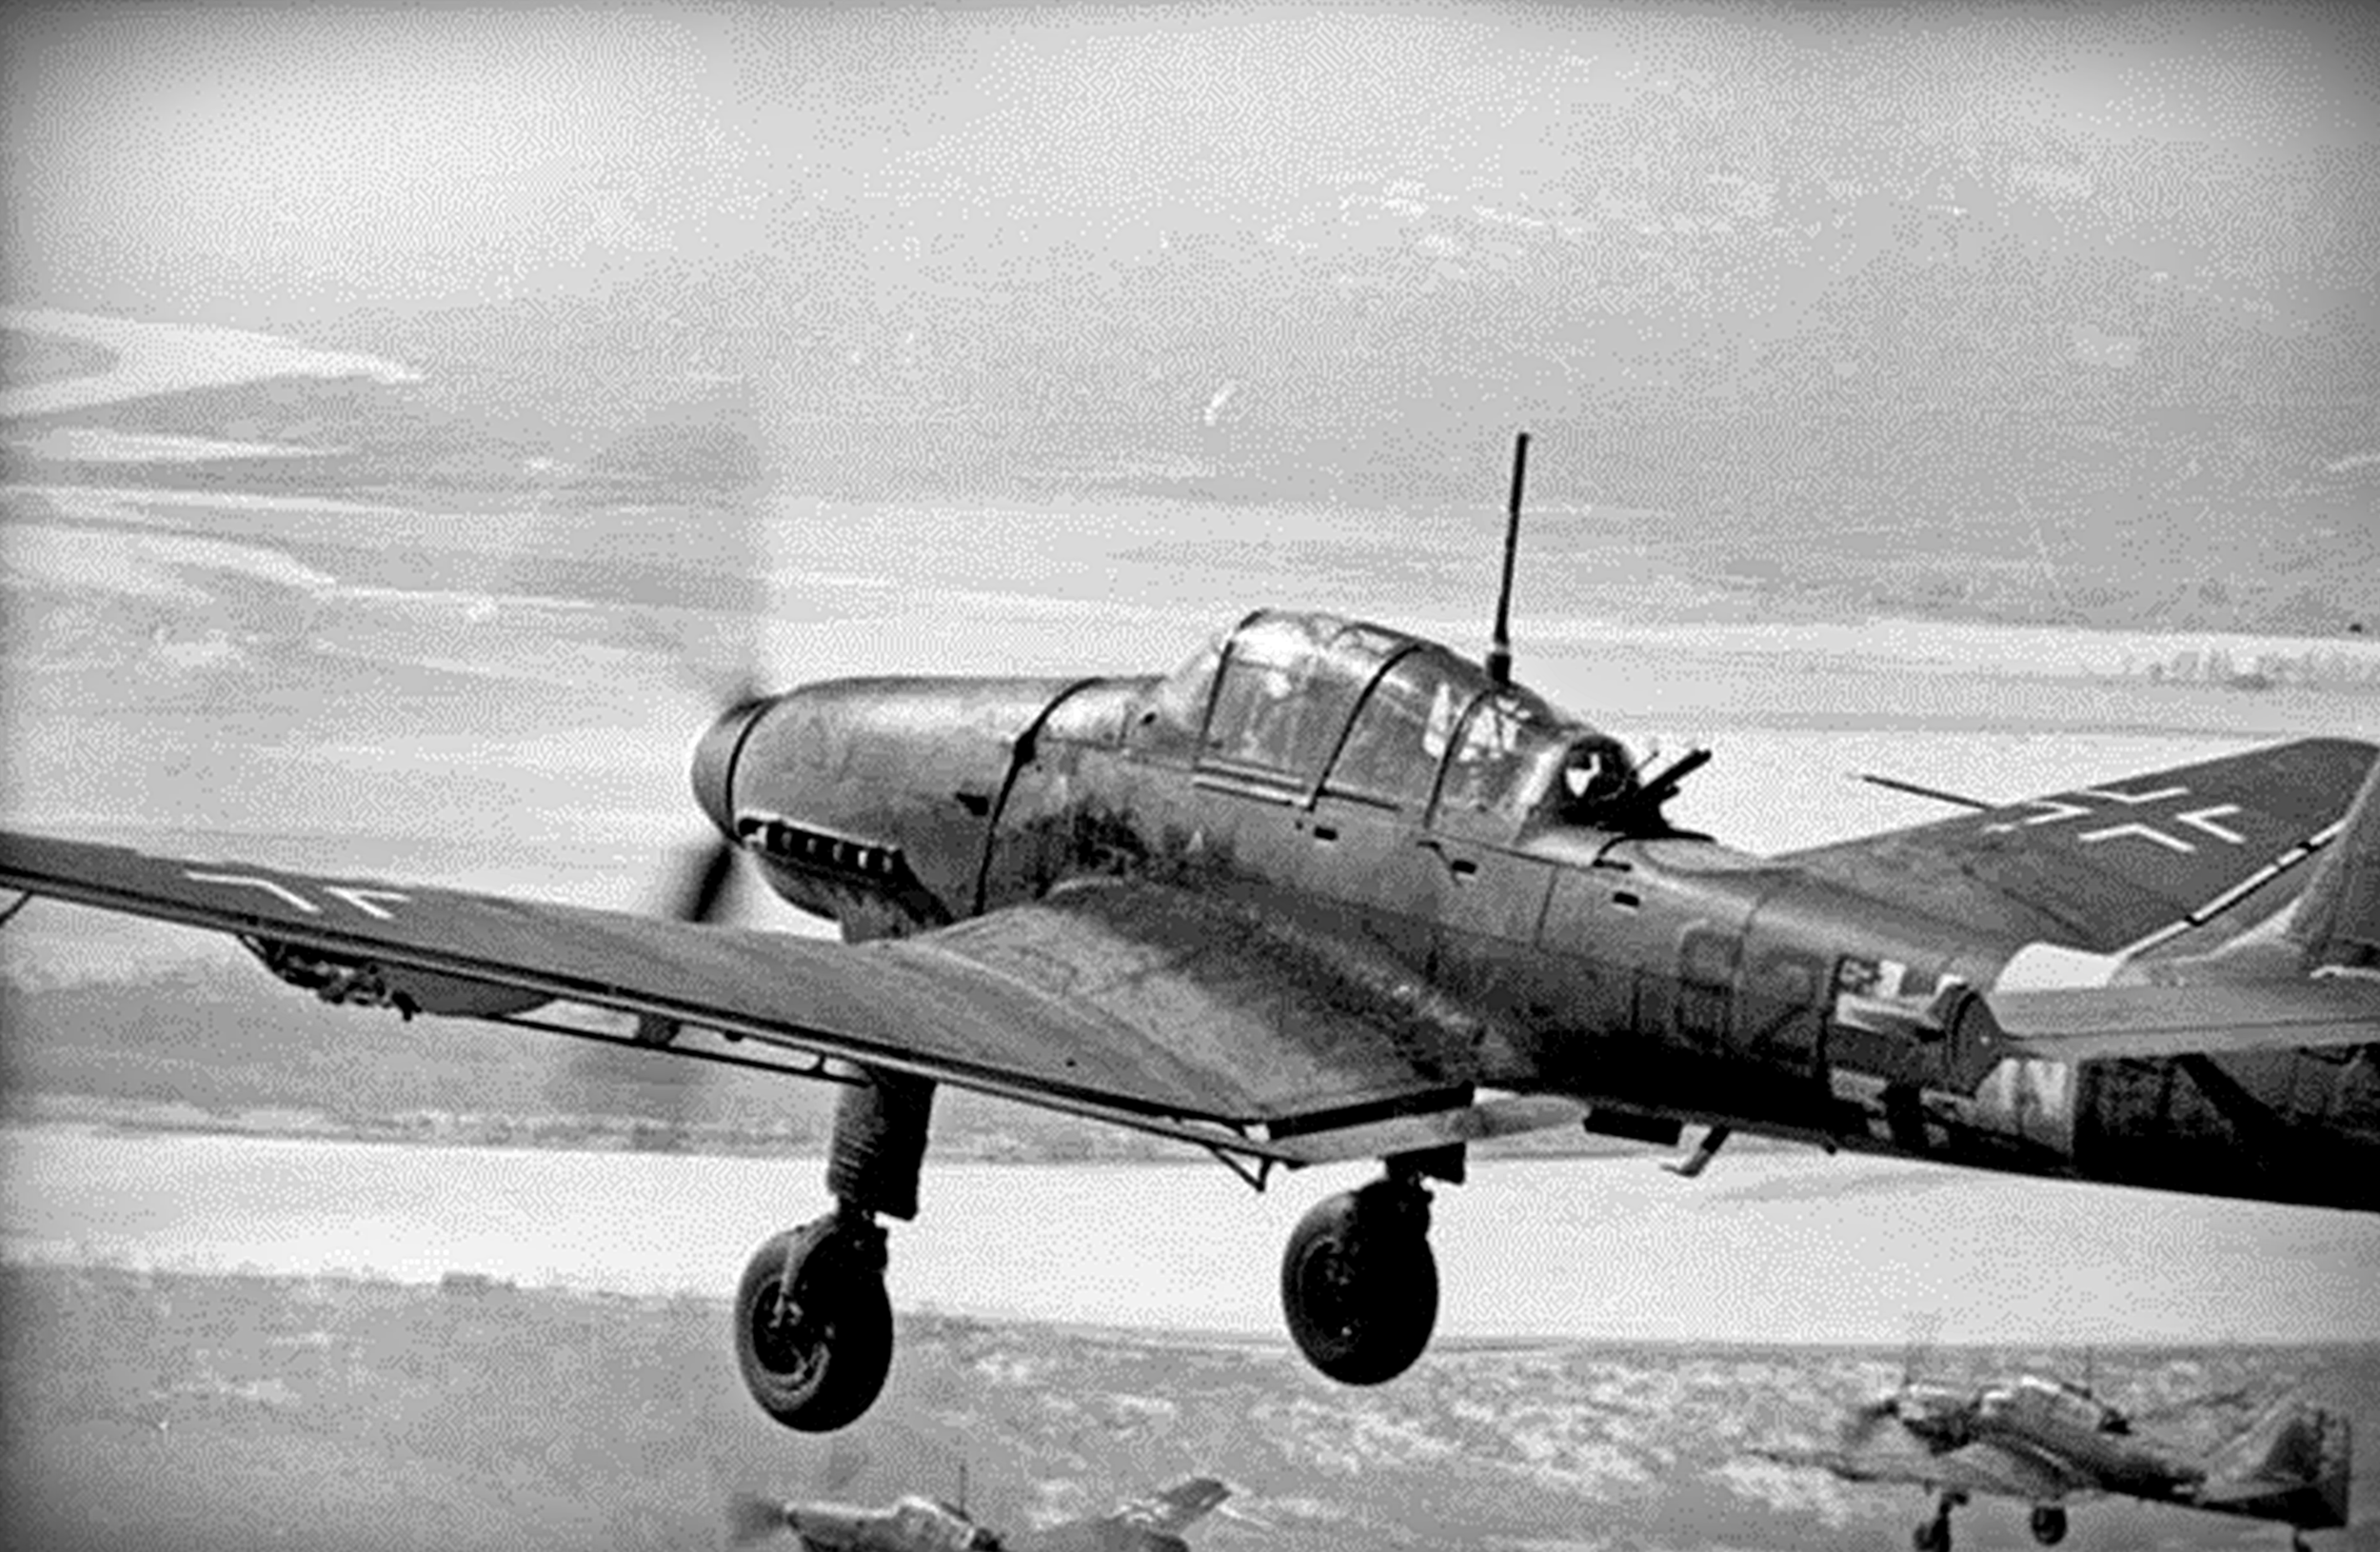 Ju-87 Stuka Dive Bomber